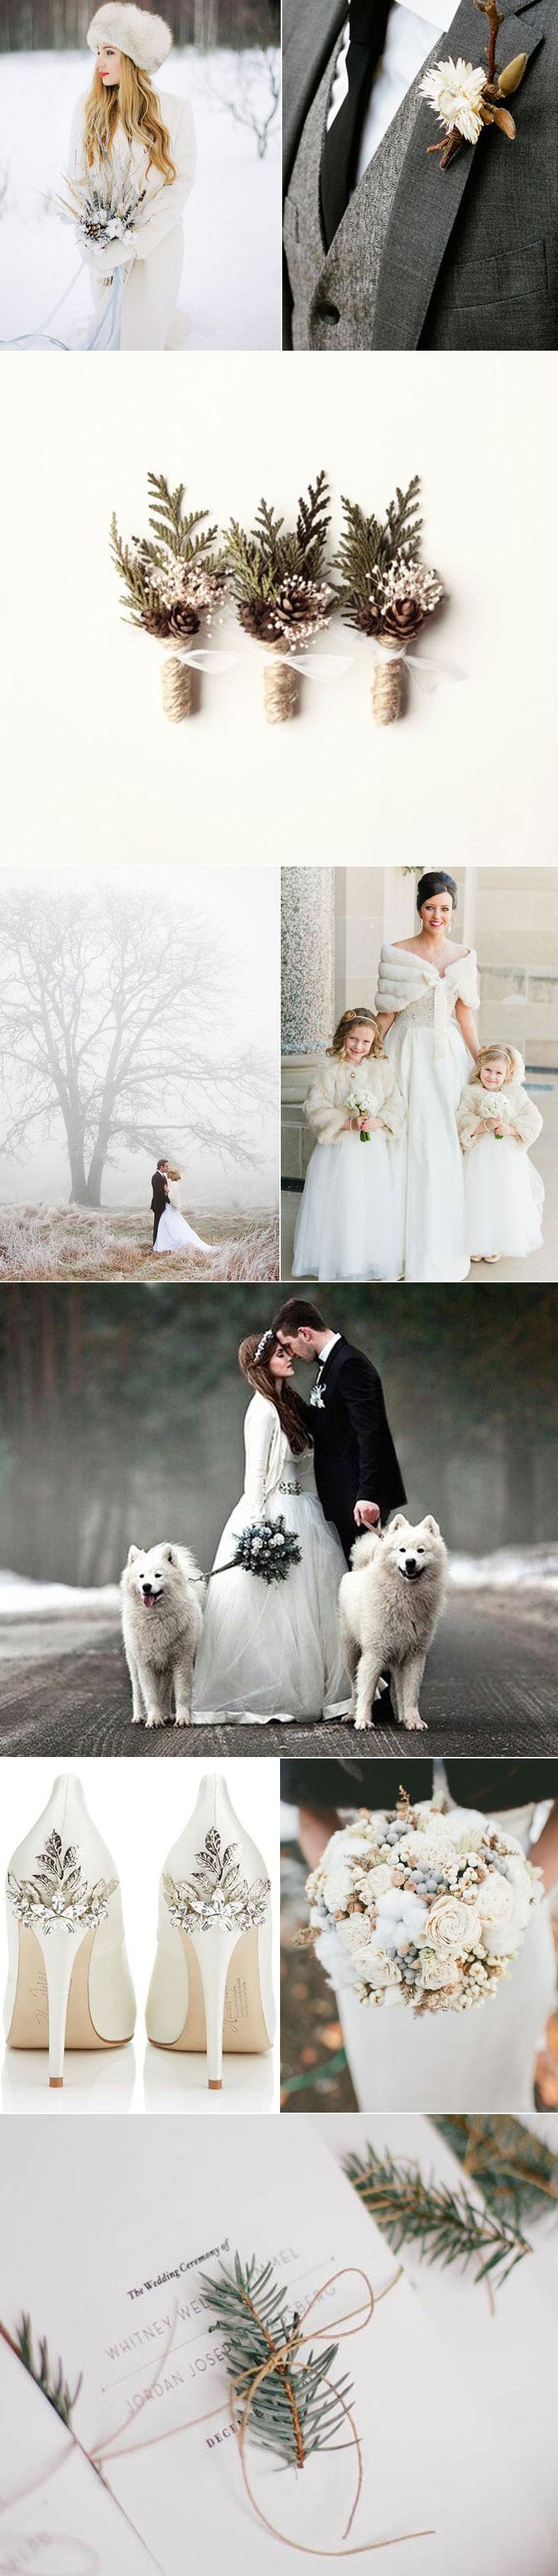 Planning A White Wedding